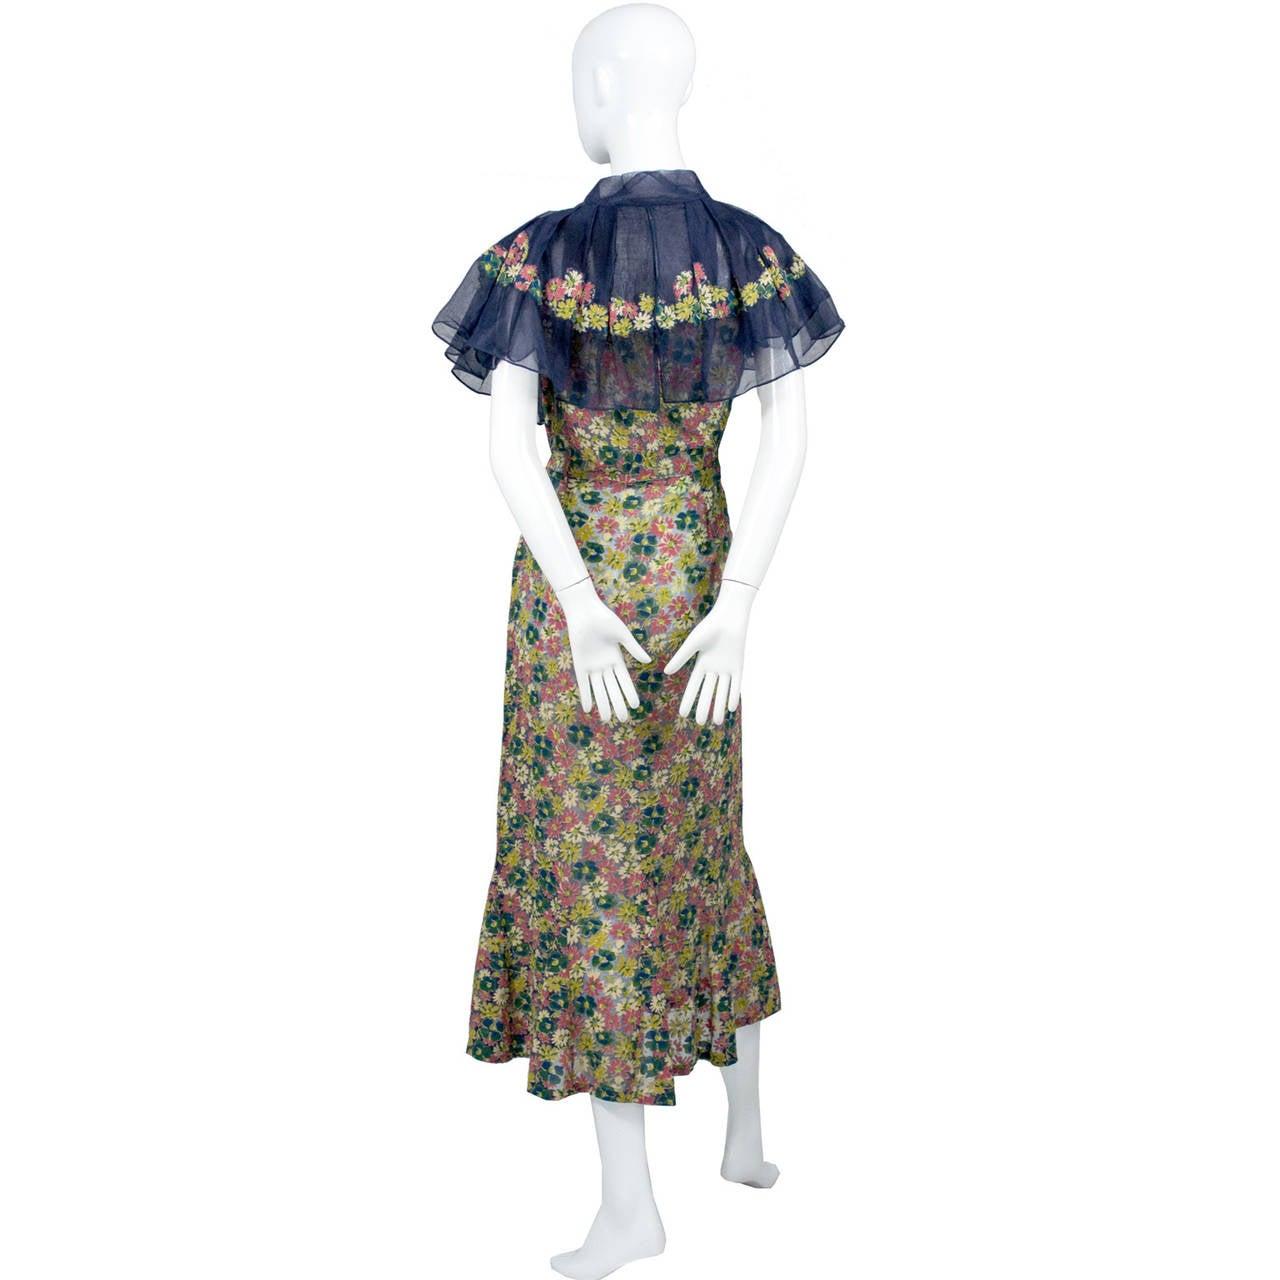 Rare 1930s Vintage Chanel Adaptation Dress Floral Velvet Applique Silk Organza 2